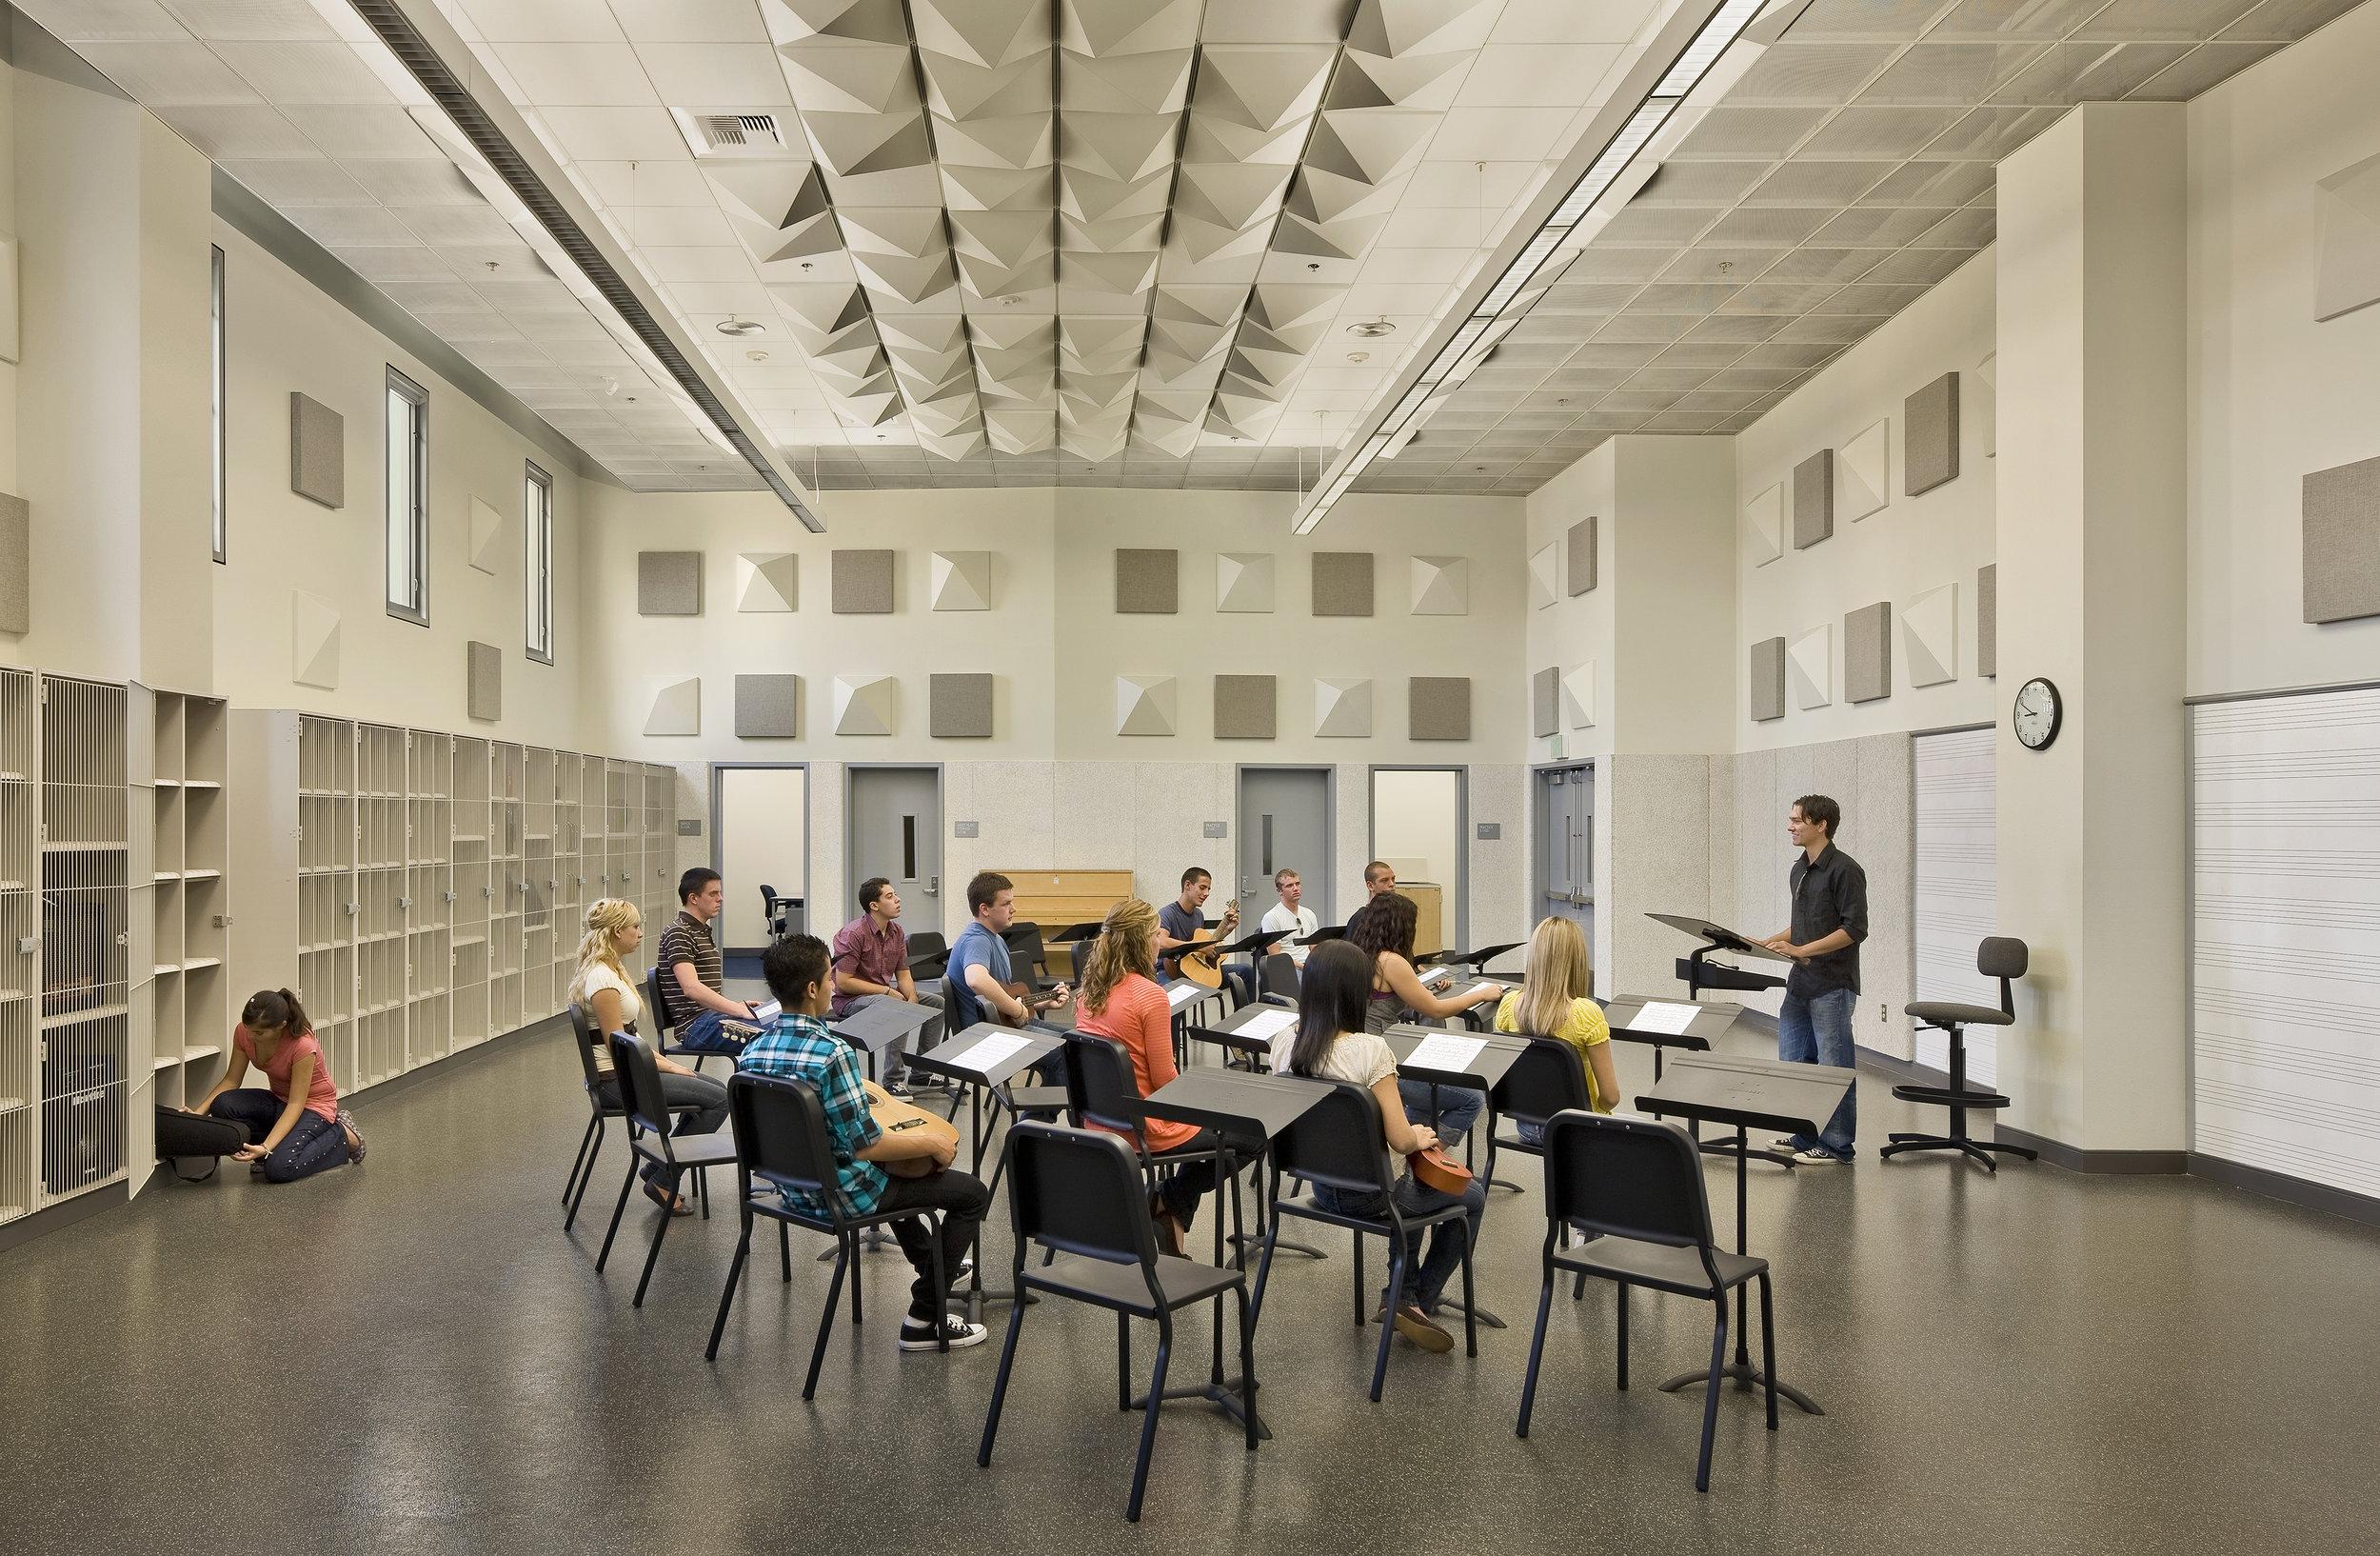 LAUSD Ramon C. Cortines School of Visual and Performing Arts